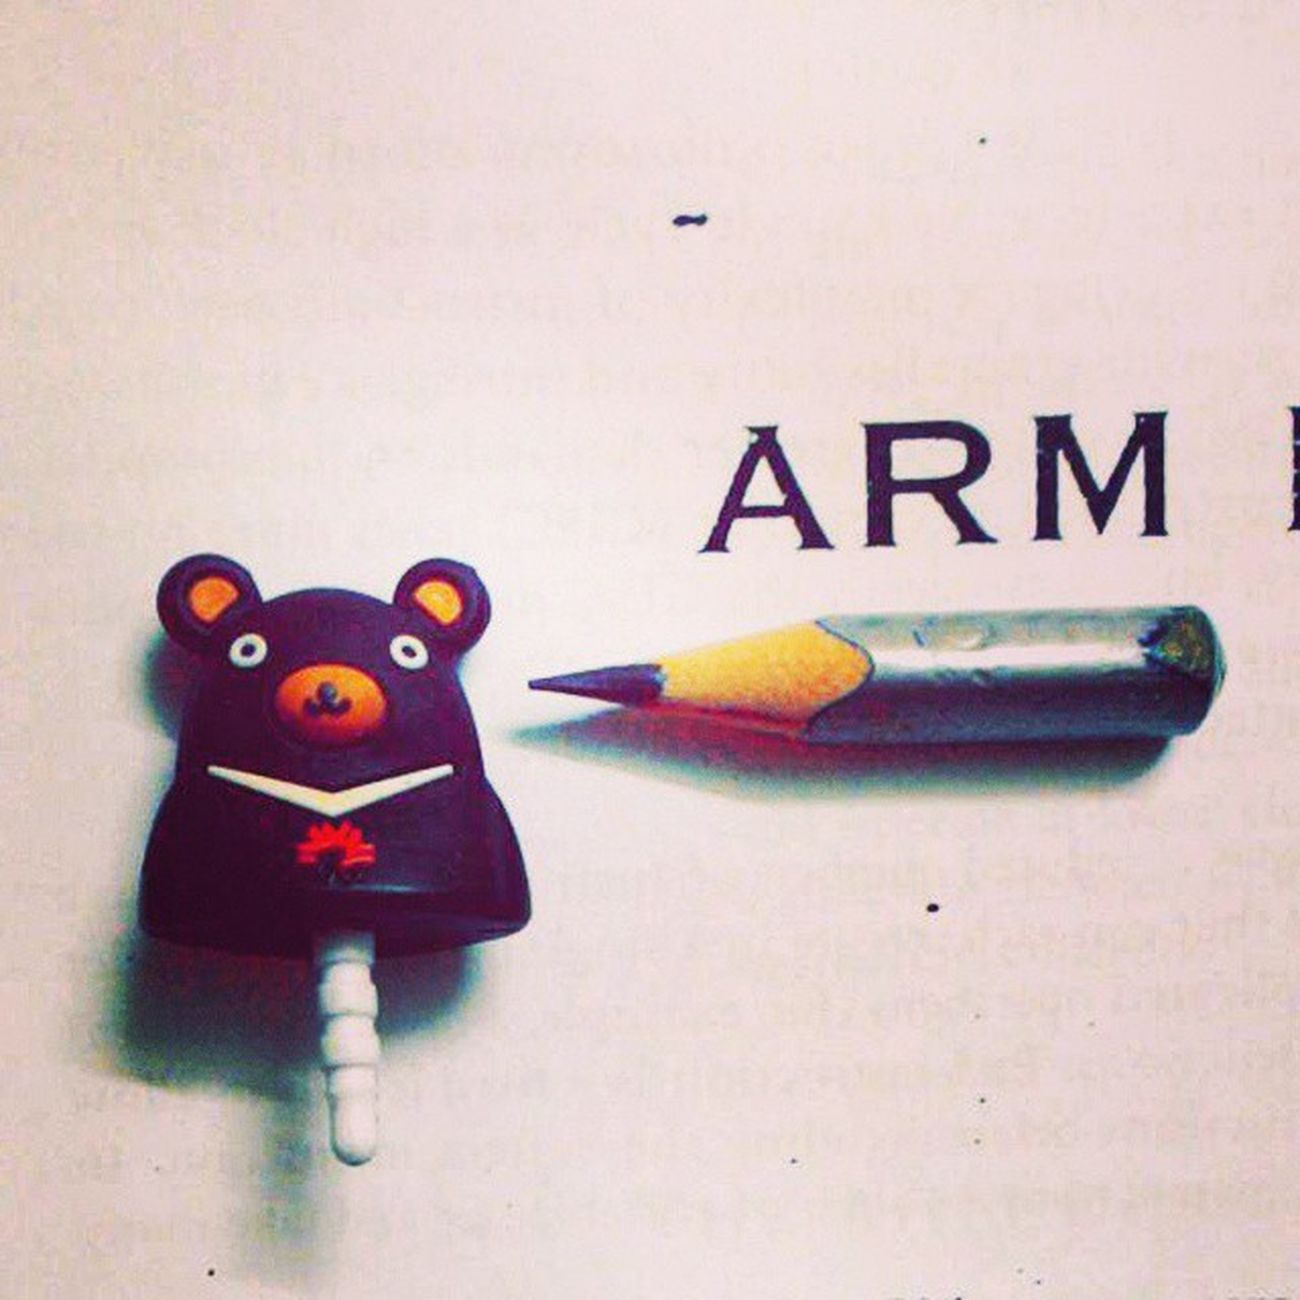 Arm MP Study Exam Toy Pencil Sharp Book Read Life Love College Crazy Fun Followed Followgram Madness